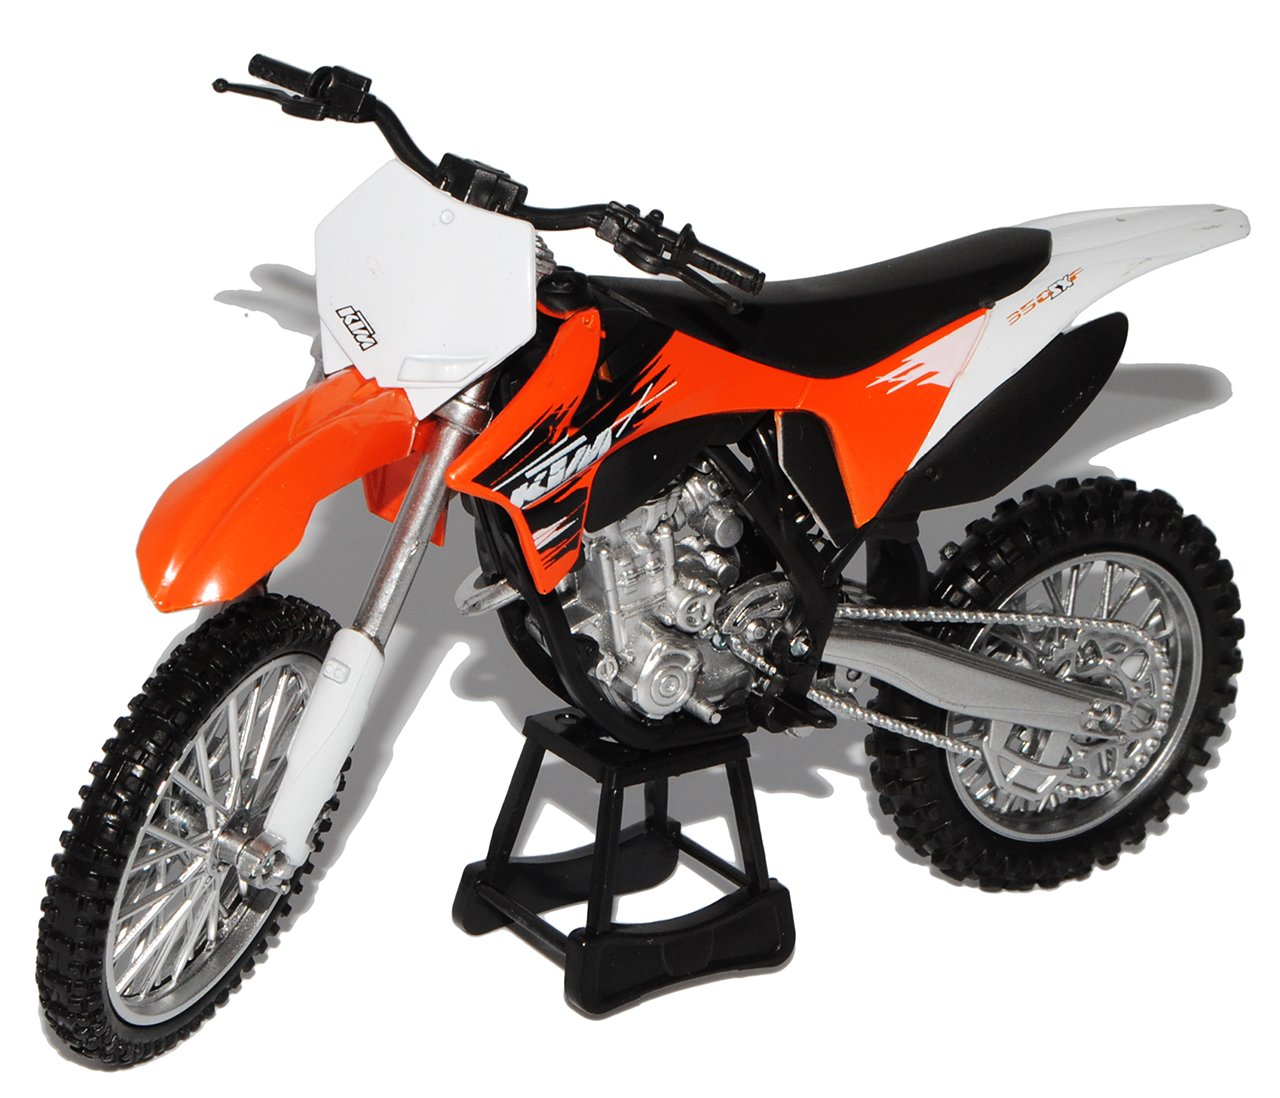 New Ray K-T-M 350 Sx-f 2011 Orange 1//12 Motorradmodelle Motorrad Modell